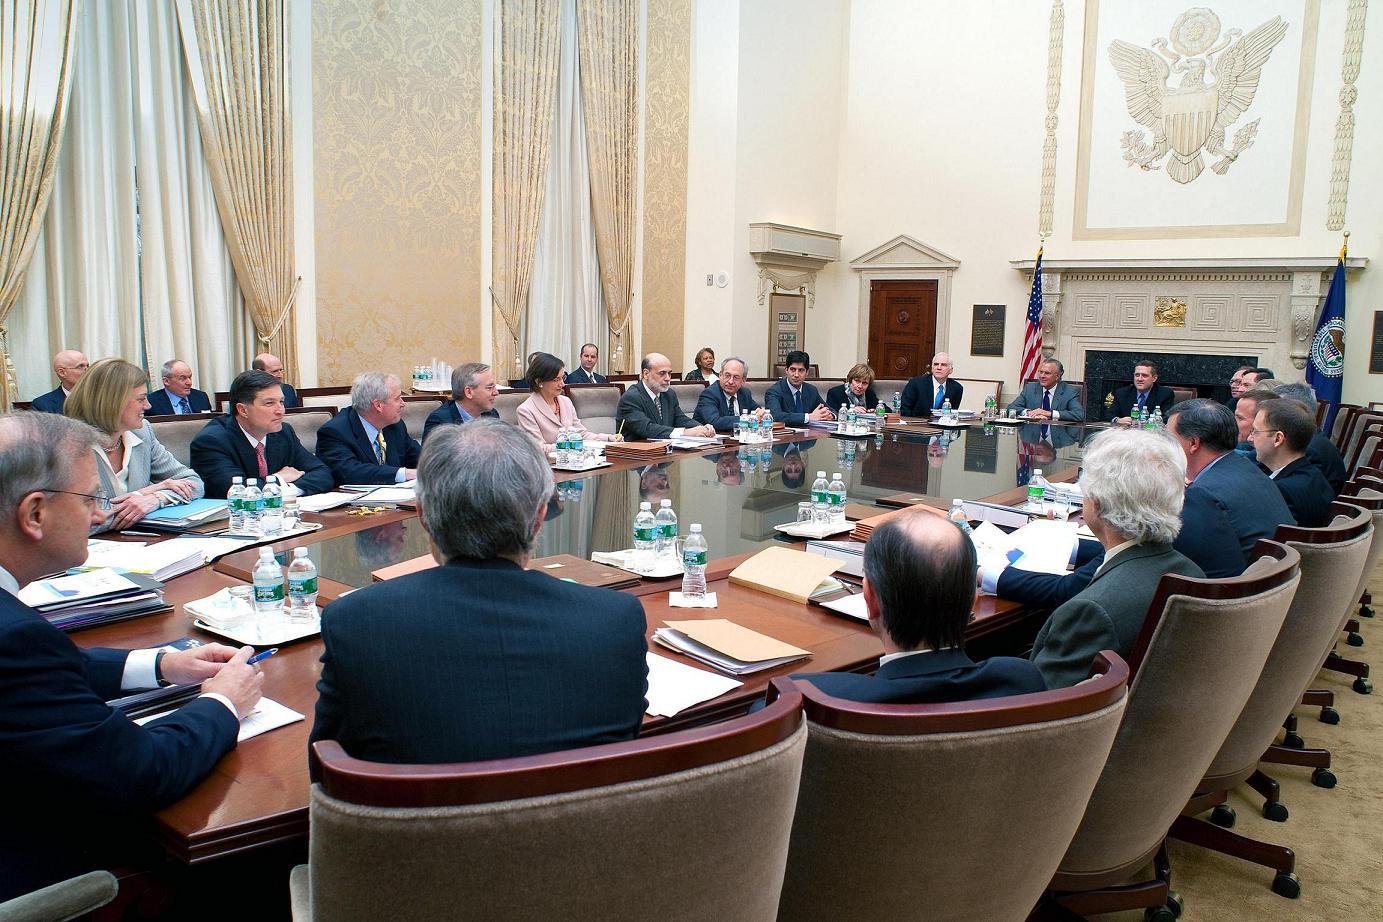 A Federal Open Market Committee (FOMC) meeting. Source: http://angrybearblog.com